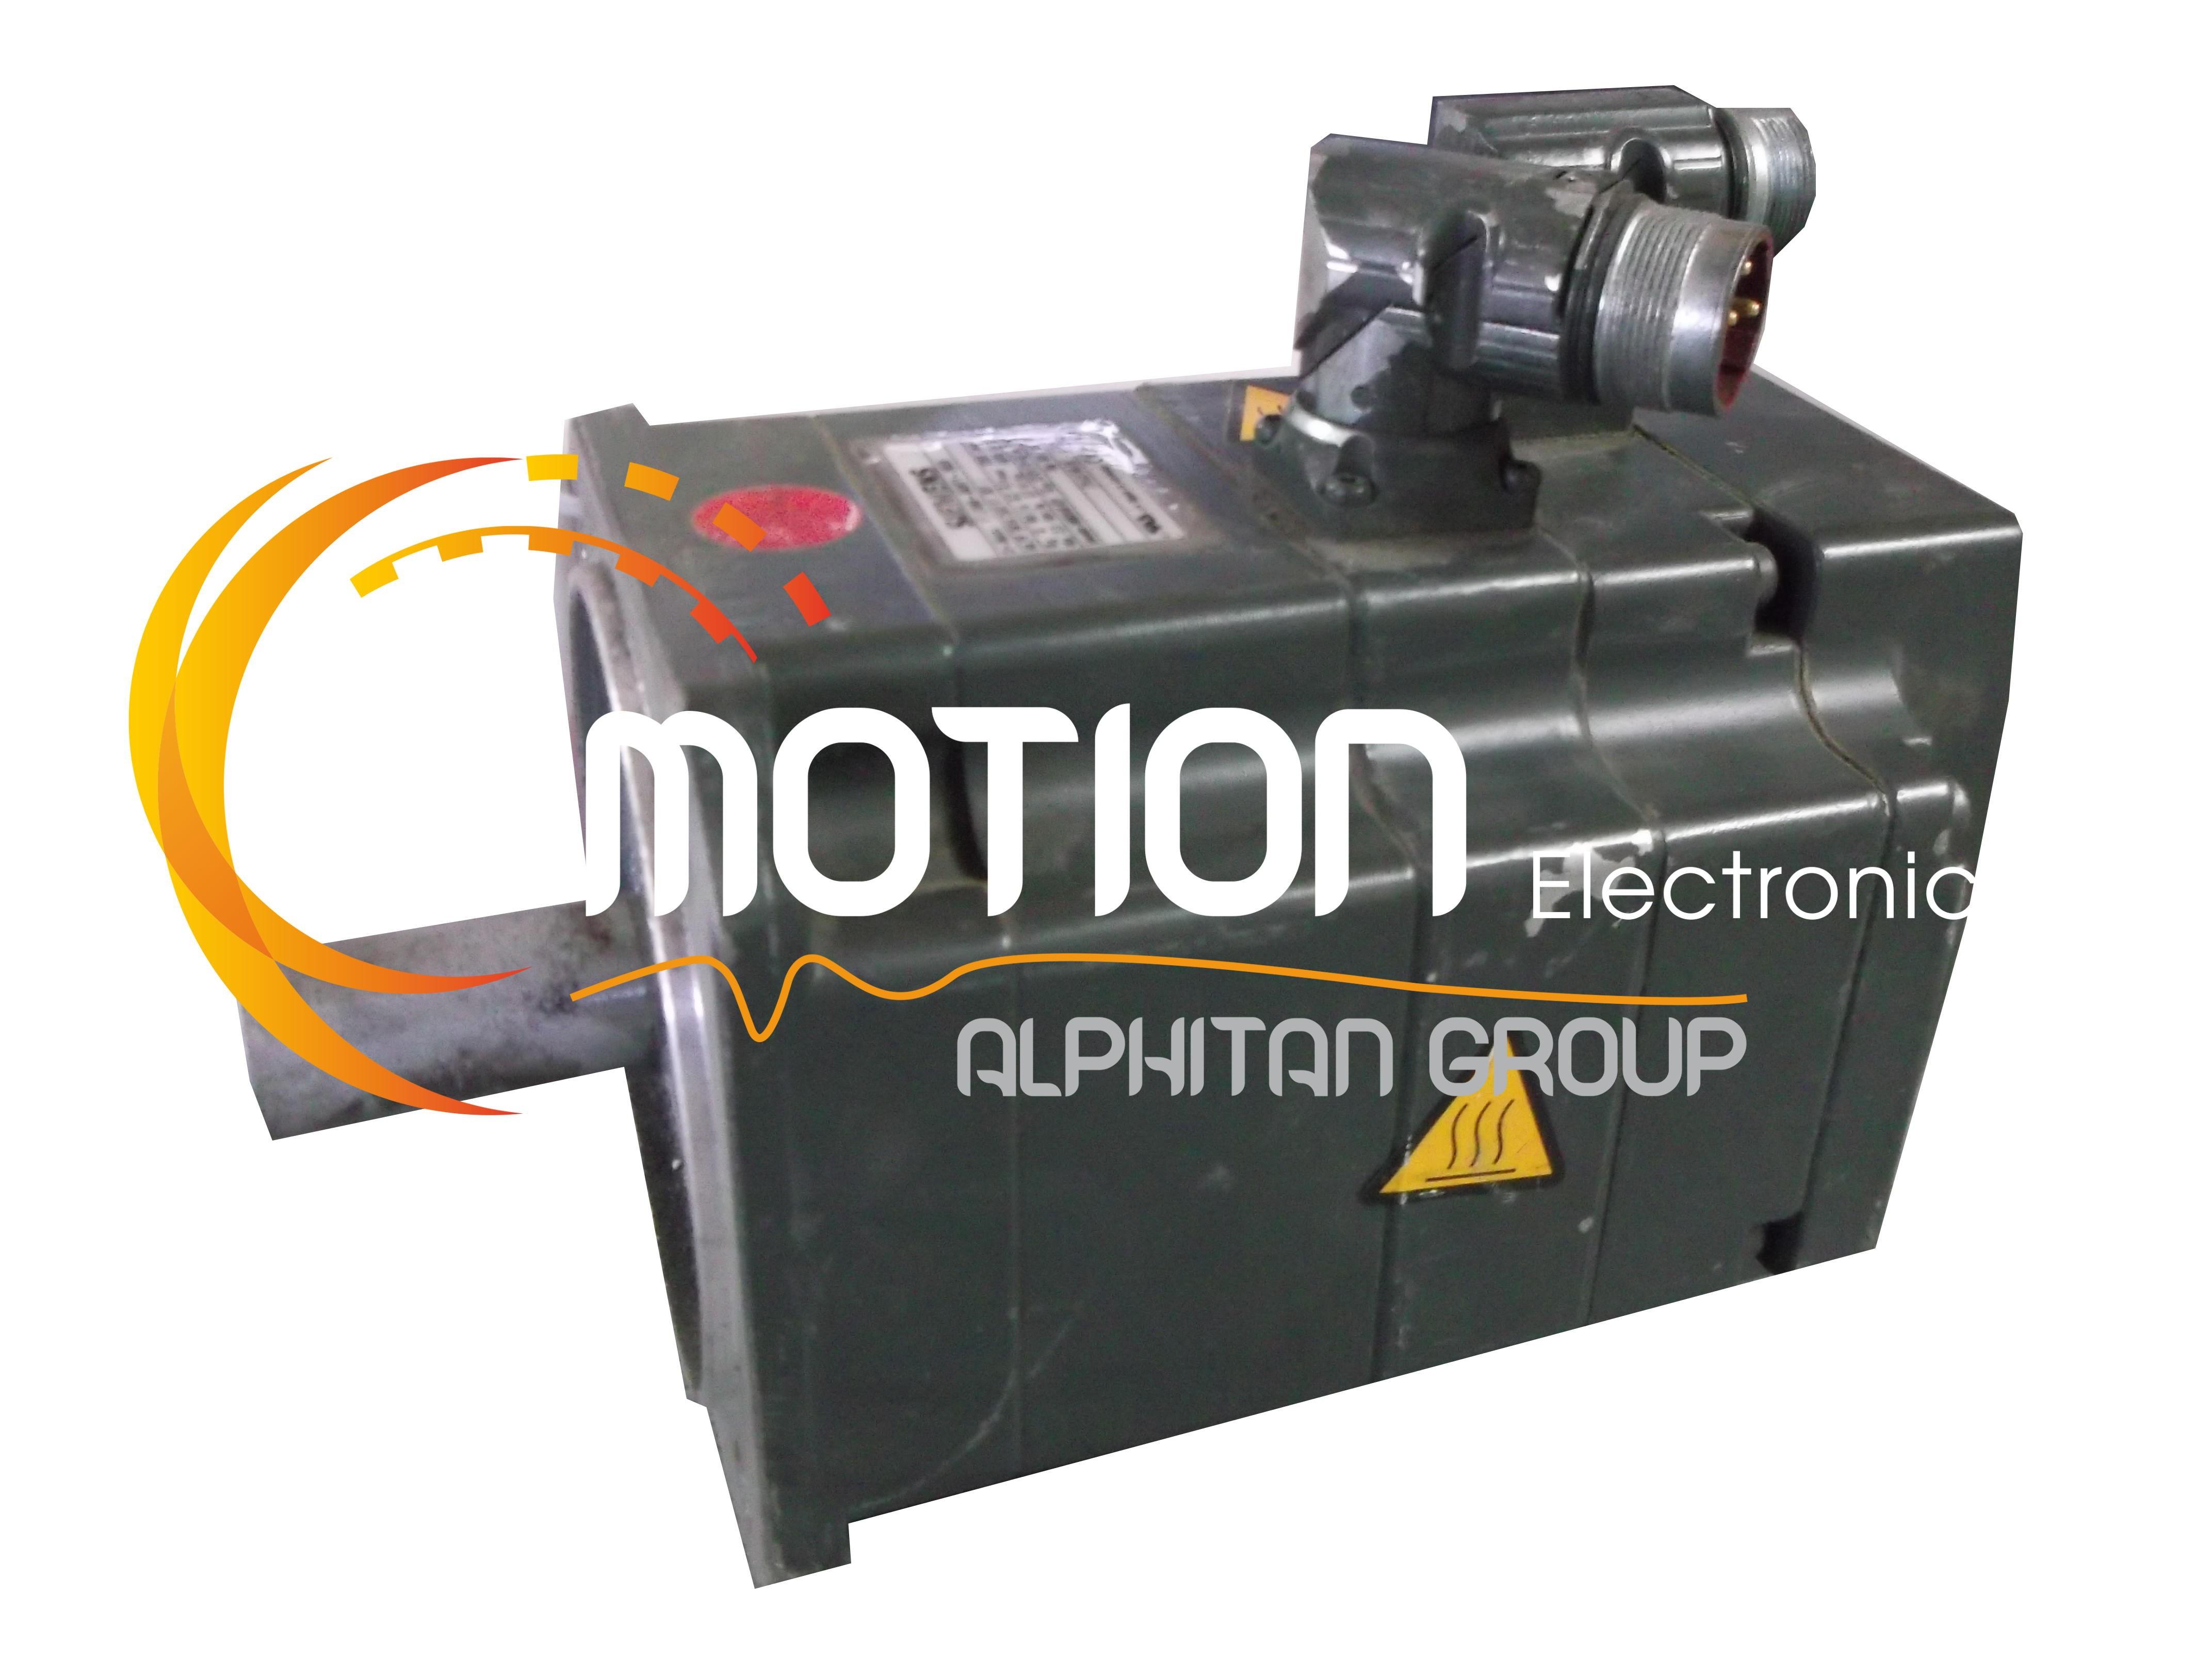 Siemens 1fk7060 5ah71 1gg5 motor for Siemens electric motors catalog